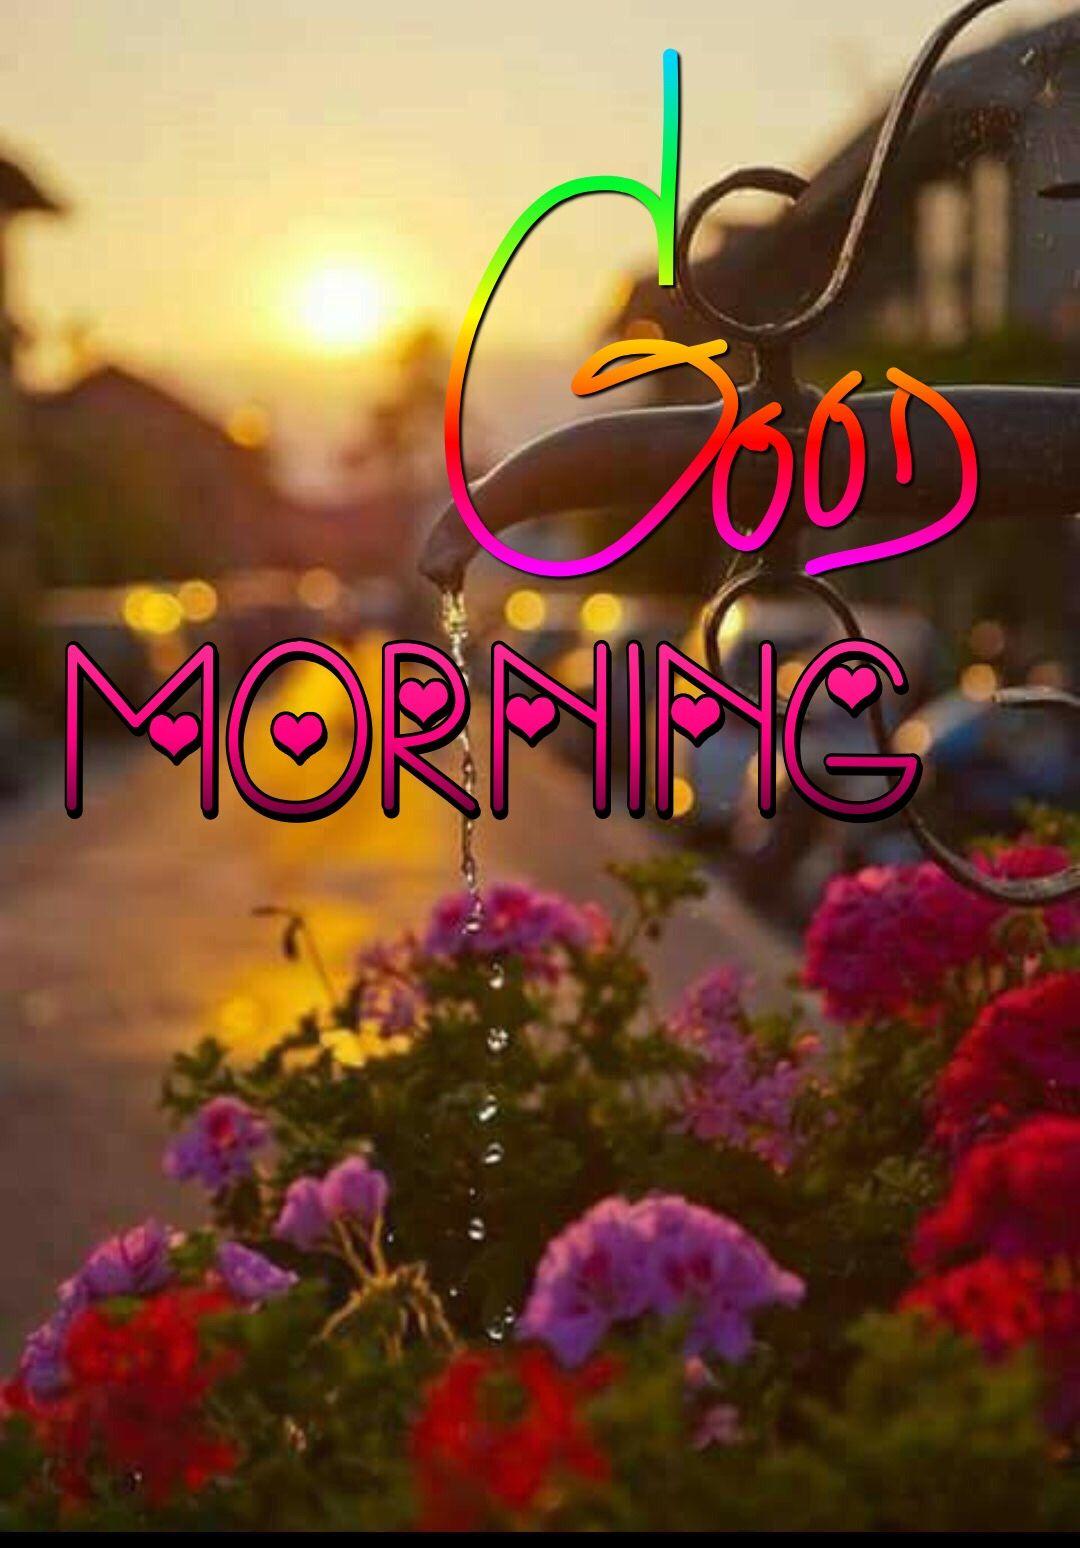 Good Morning Greetings Good Morning Quotes Morning Quotes Happy Morning Quotes